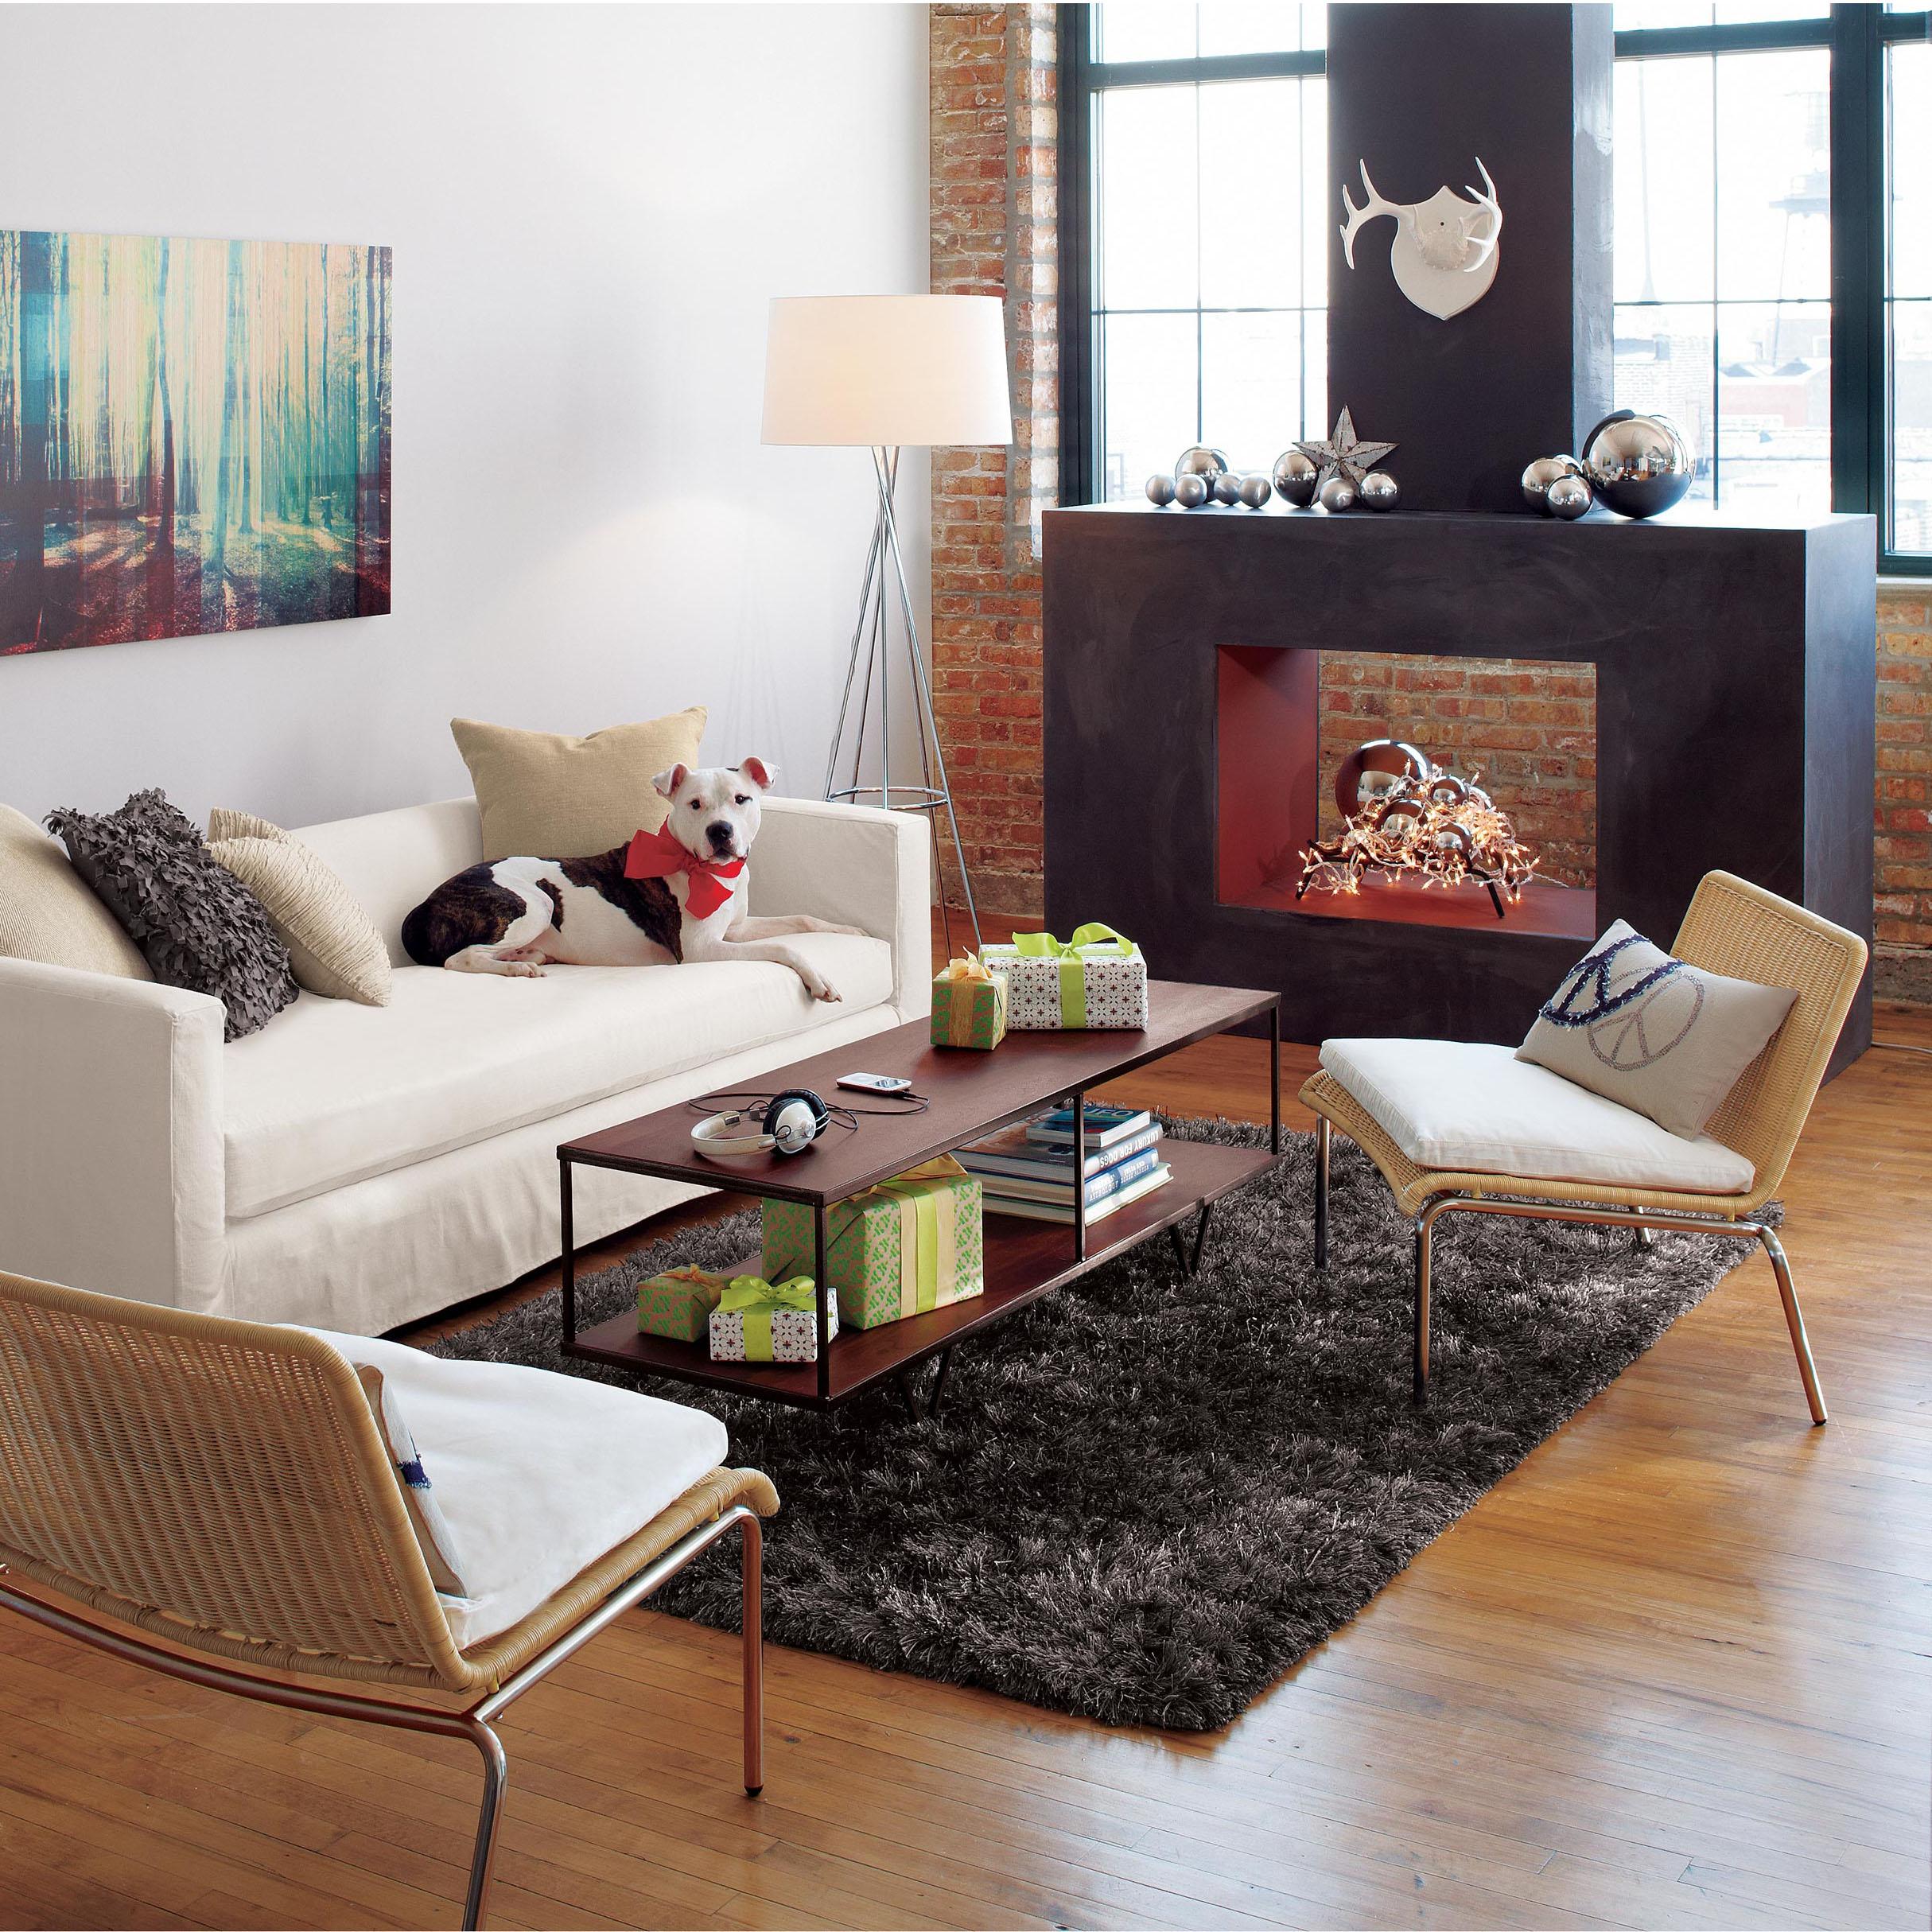 CB2_living-room_fireplace_molly-fitzsimons.jpg